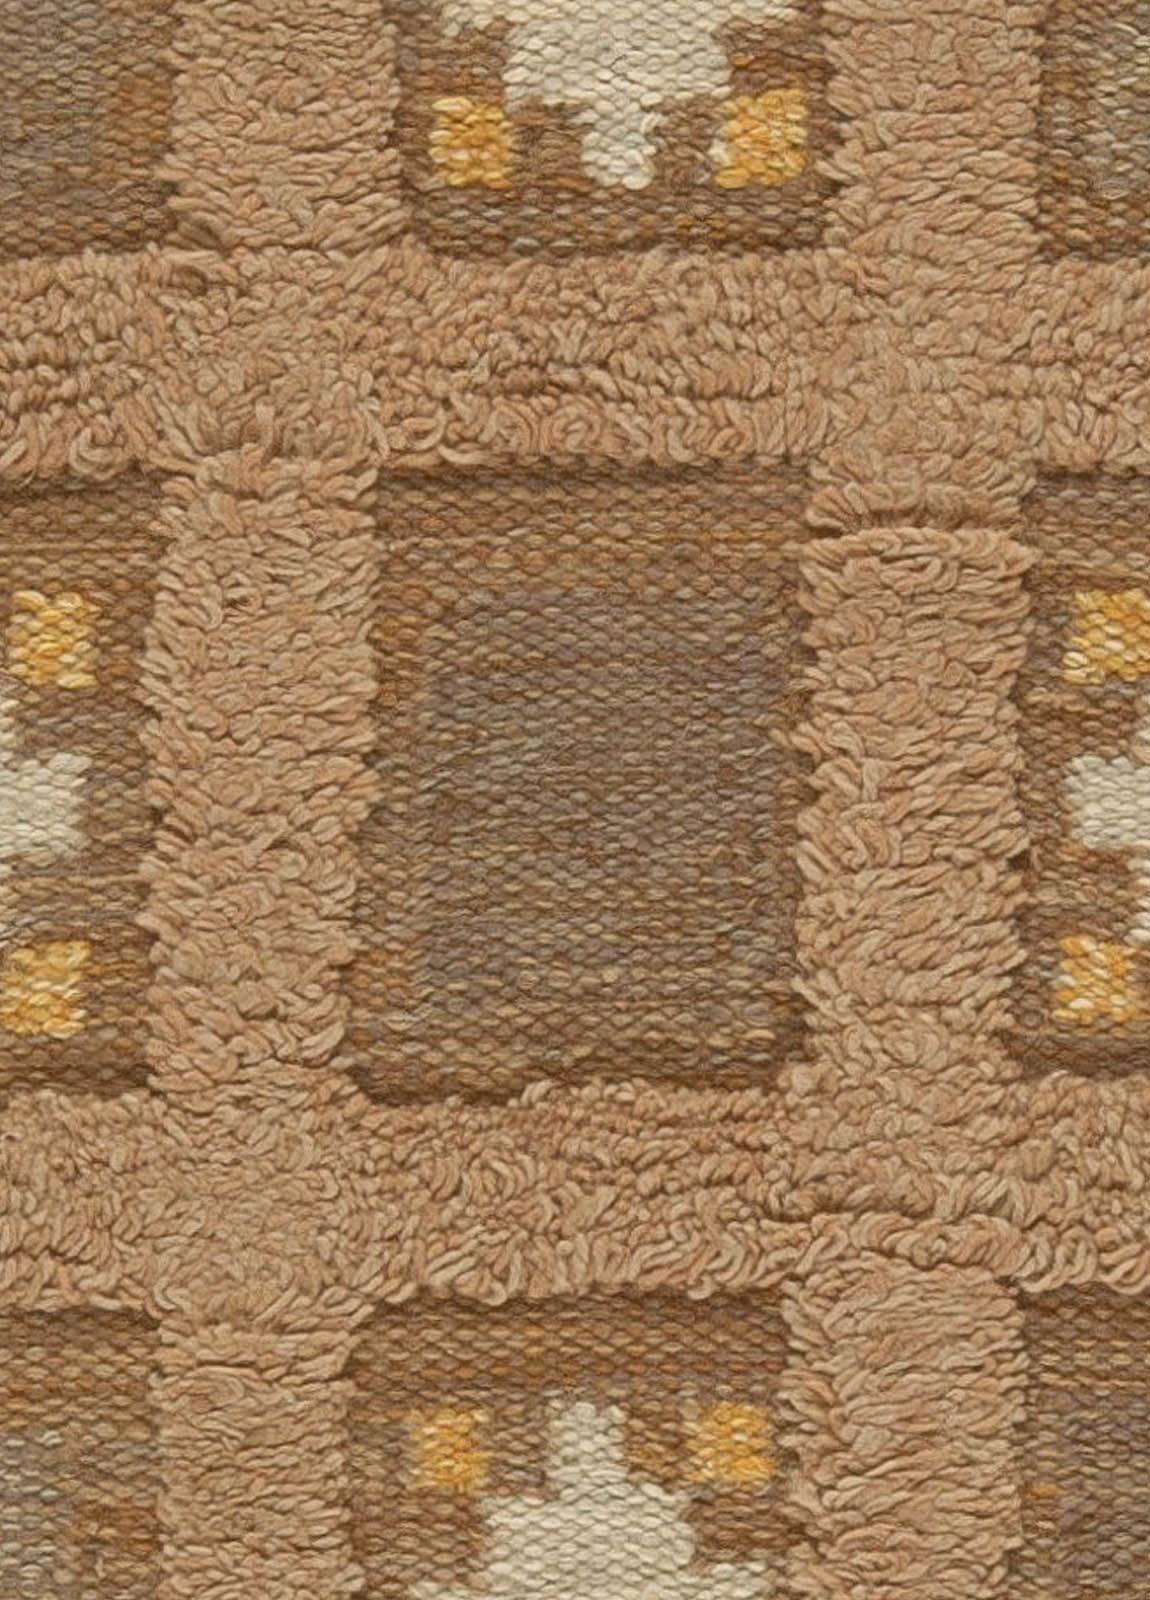 Robust Bb5456 A Swedsih Low Pile Carpet 7 3 X 4 4 Master Low Pile Carpet Height Low Pile Carpet Thickness houzz 01 Low Pile Carpet